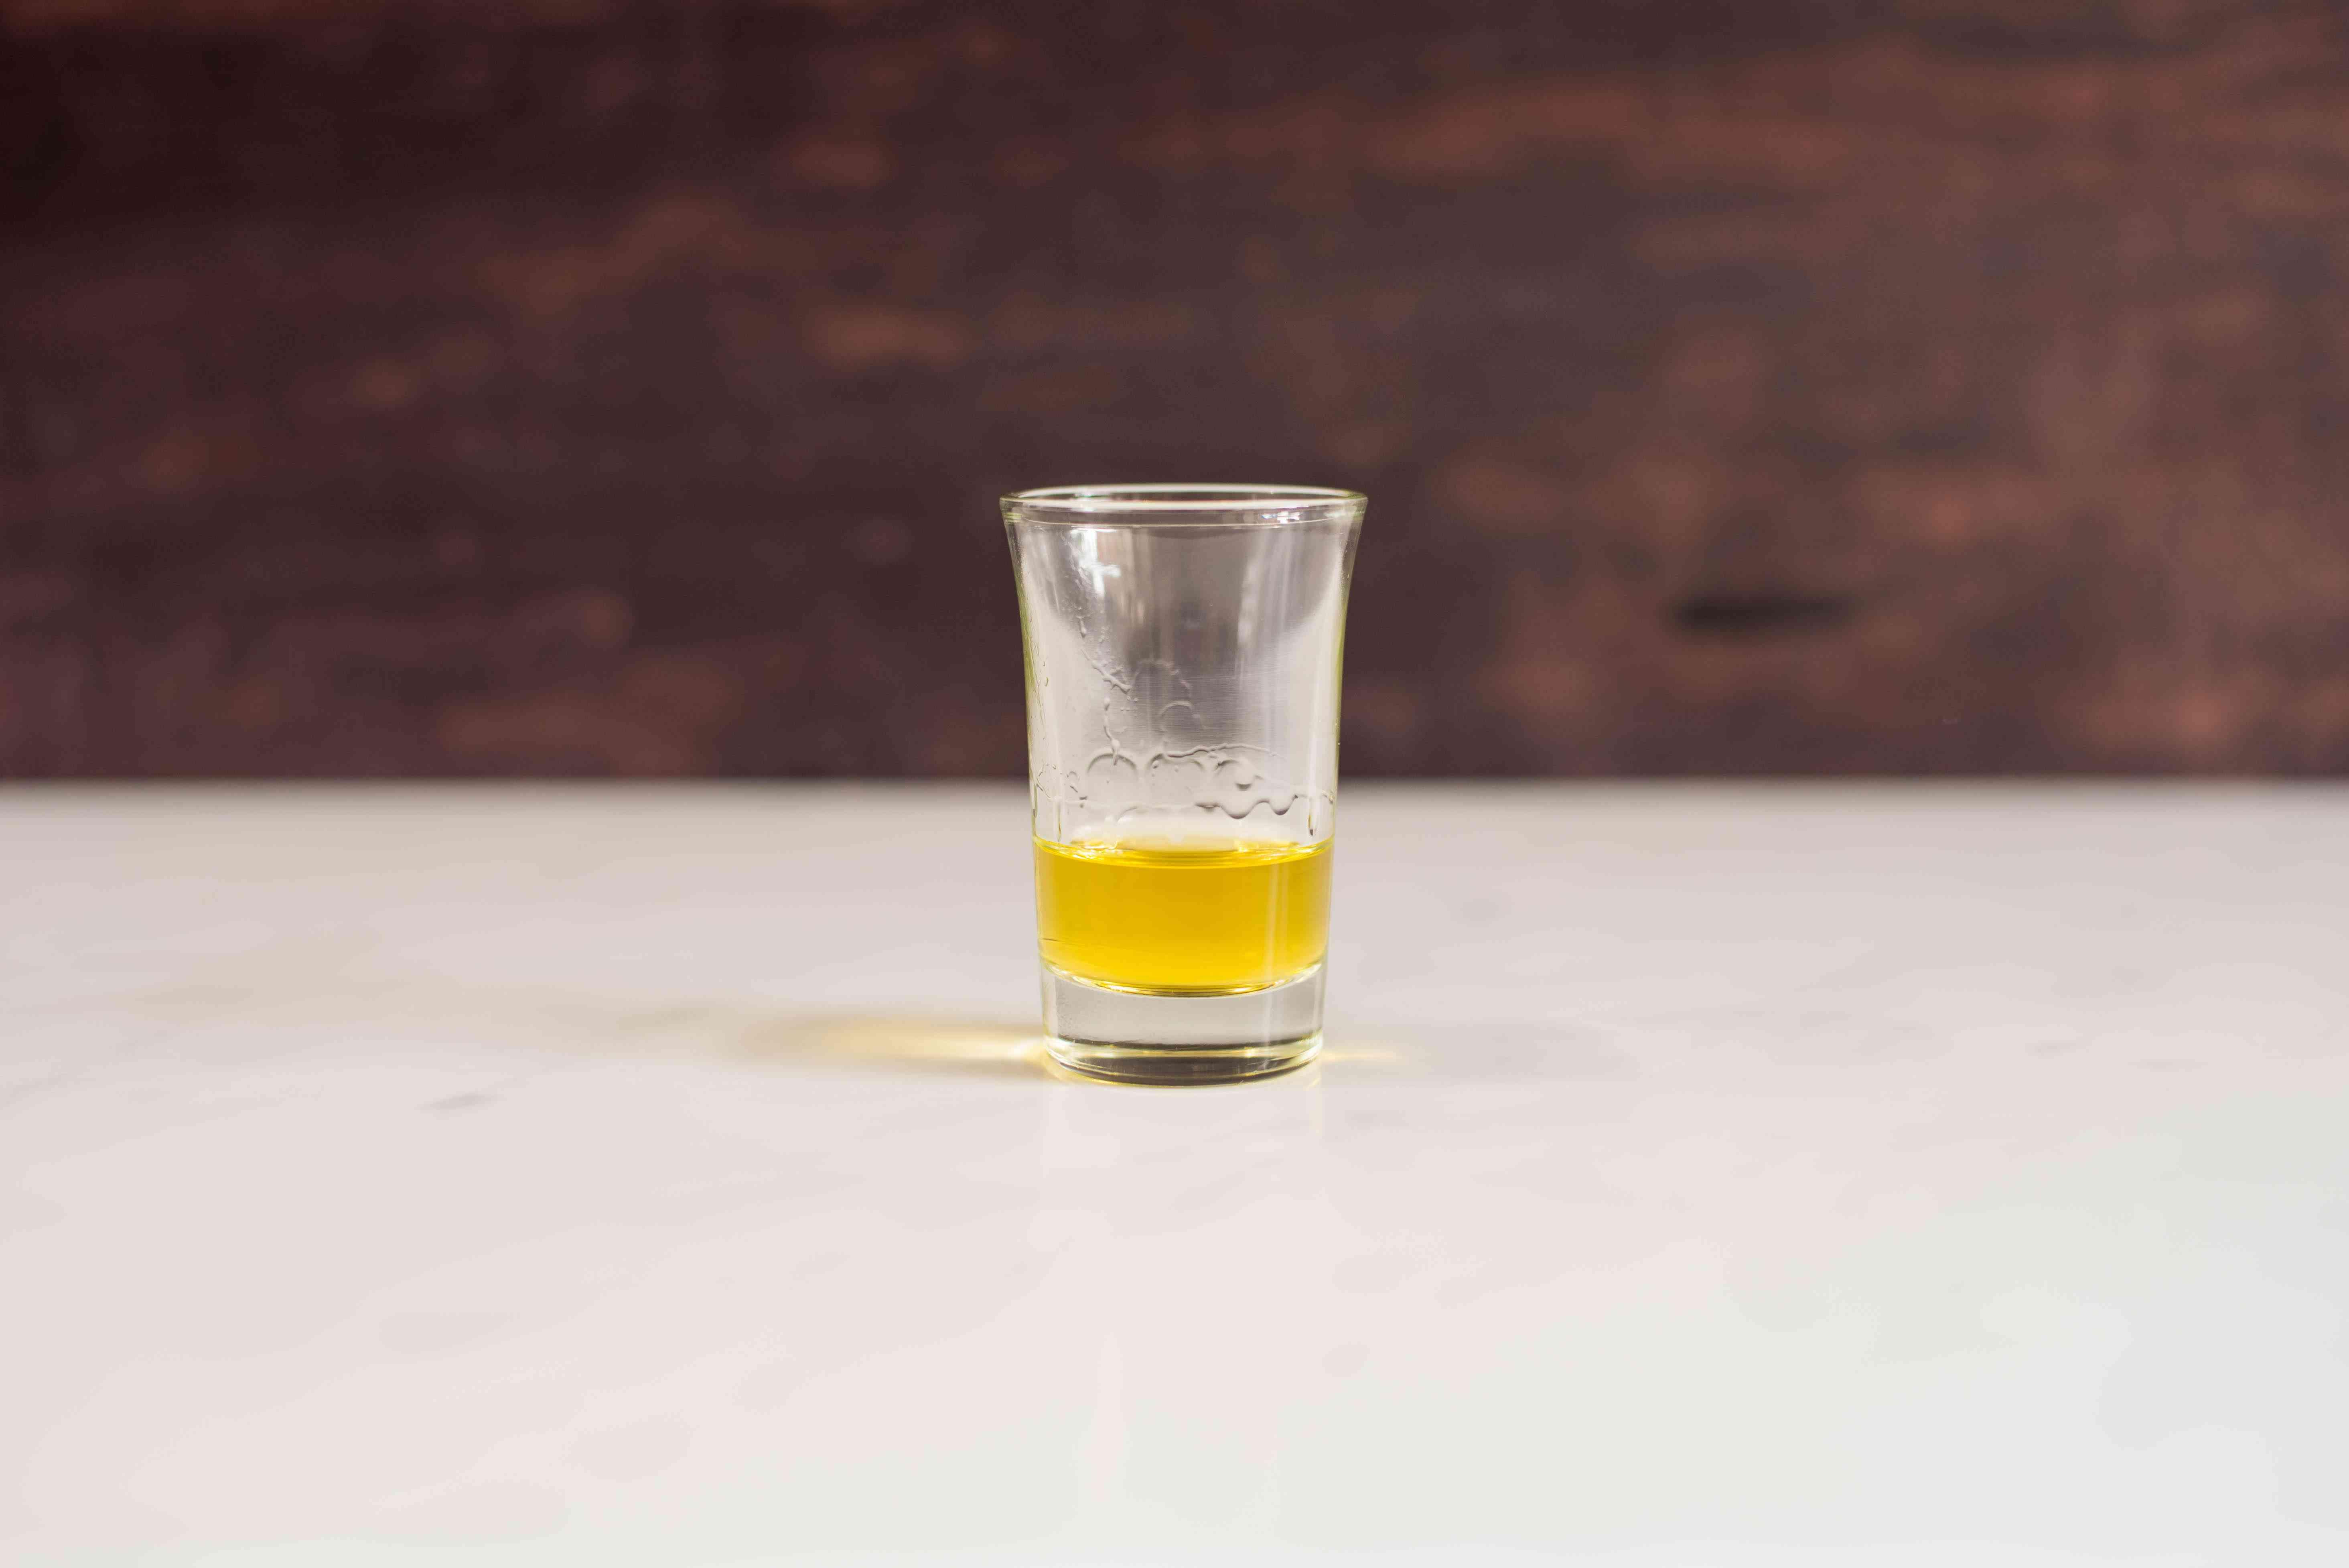 Pour Galliano in shot glass